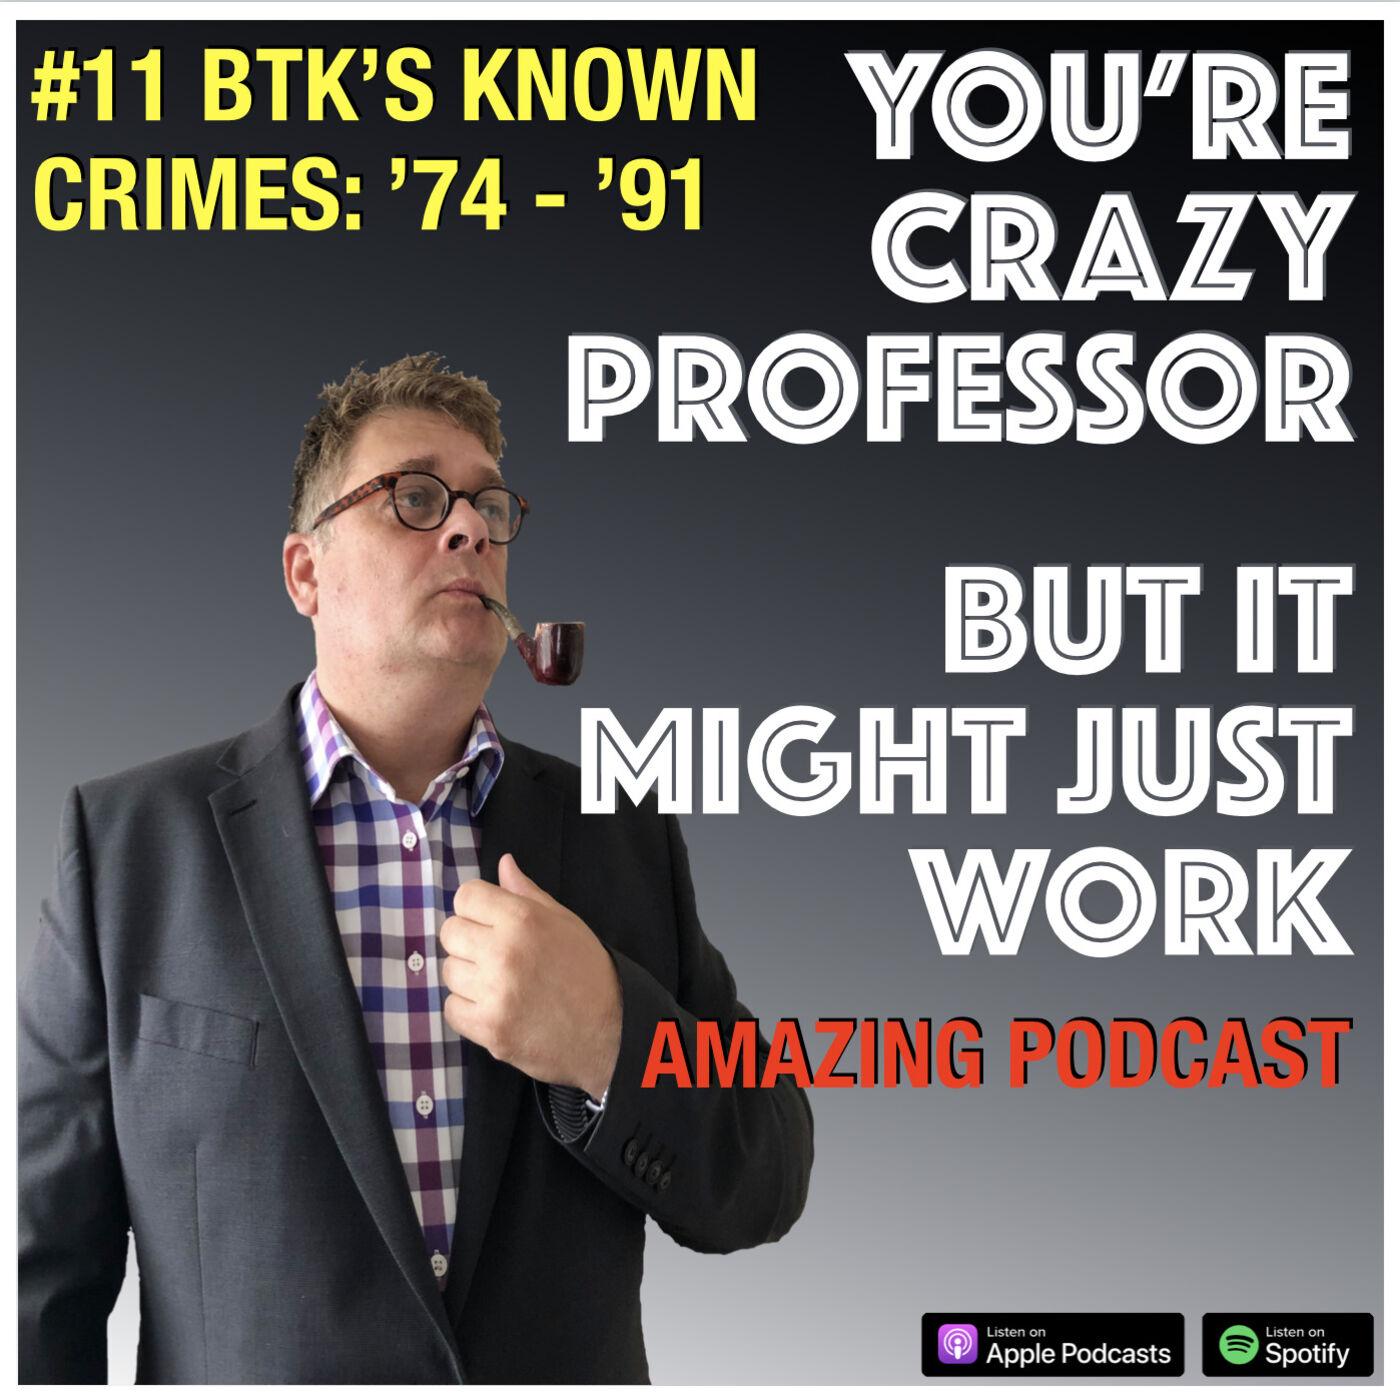 BTK's known crimes 1974 - 1991